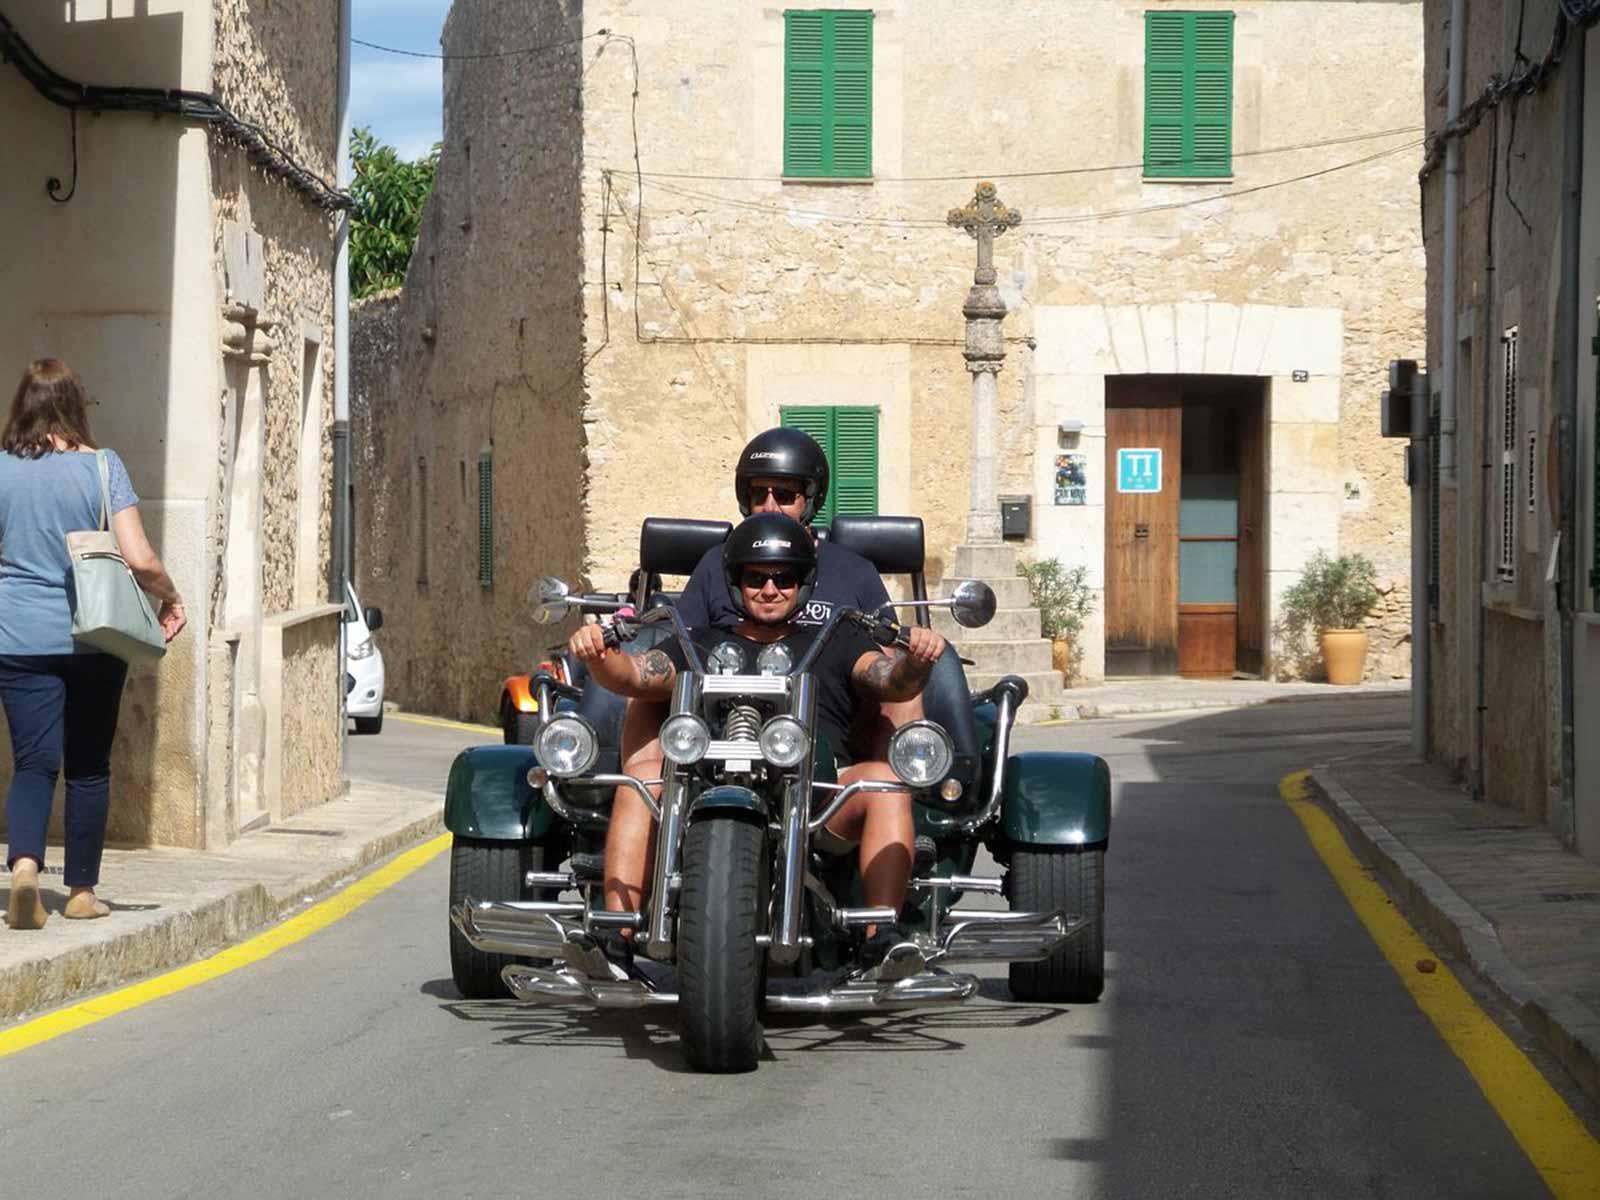 Trike-Mallorca-Trike-Tour-Mallorca-3